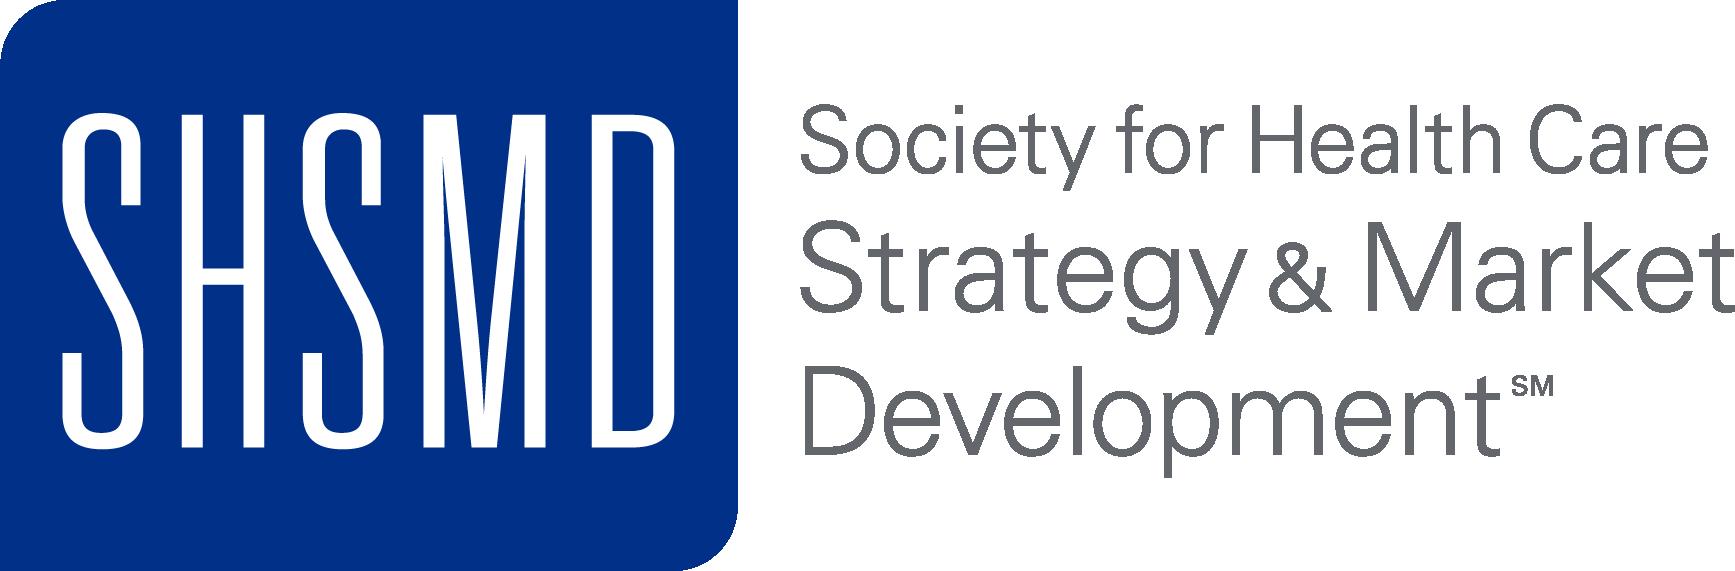 shsmd site header logo